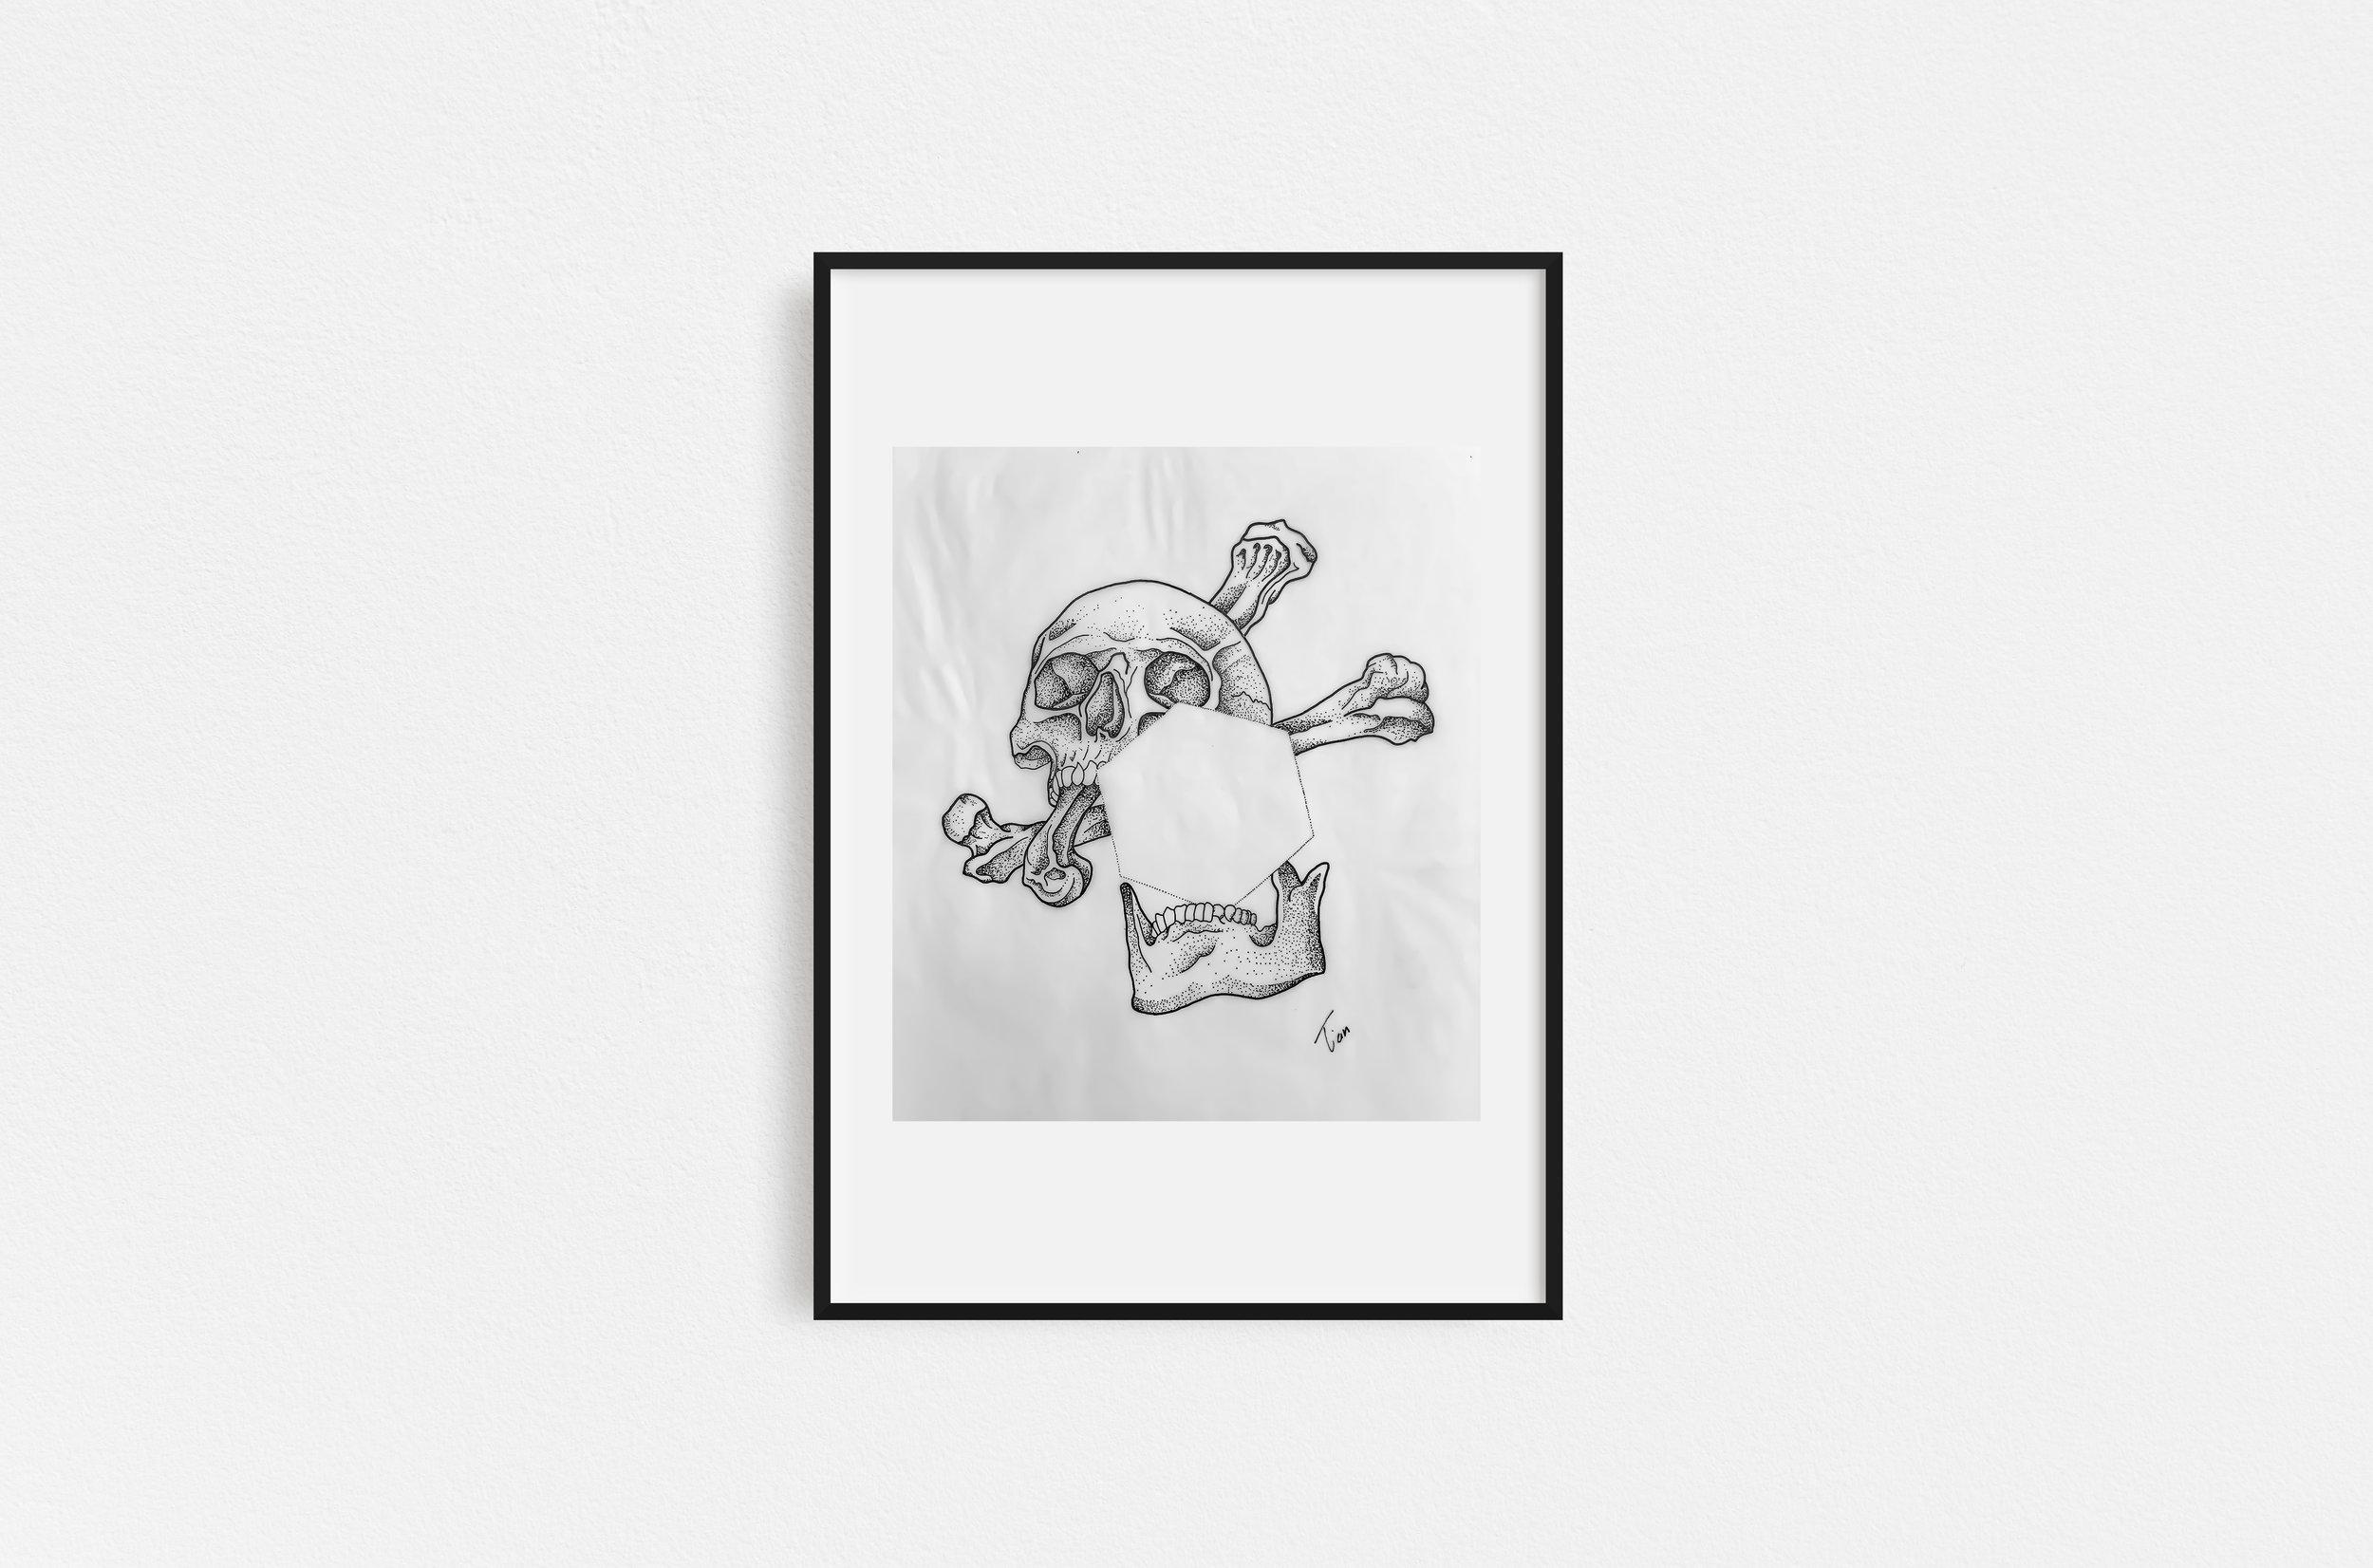 SKULL PENTAGON - sebastian exlmixed media painting32x26 cm | 12x10 in